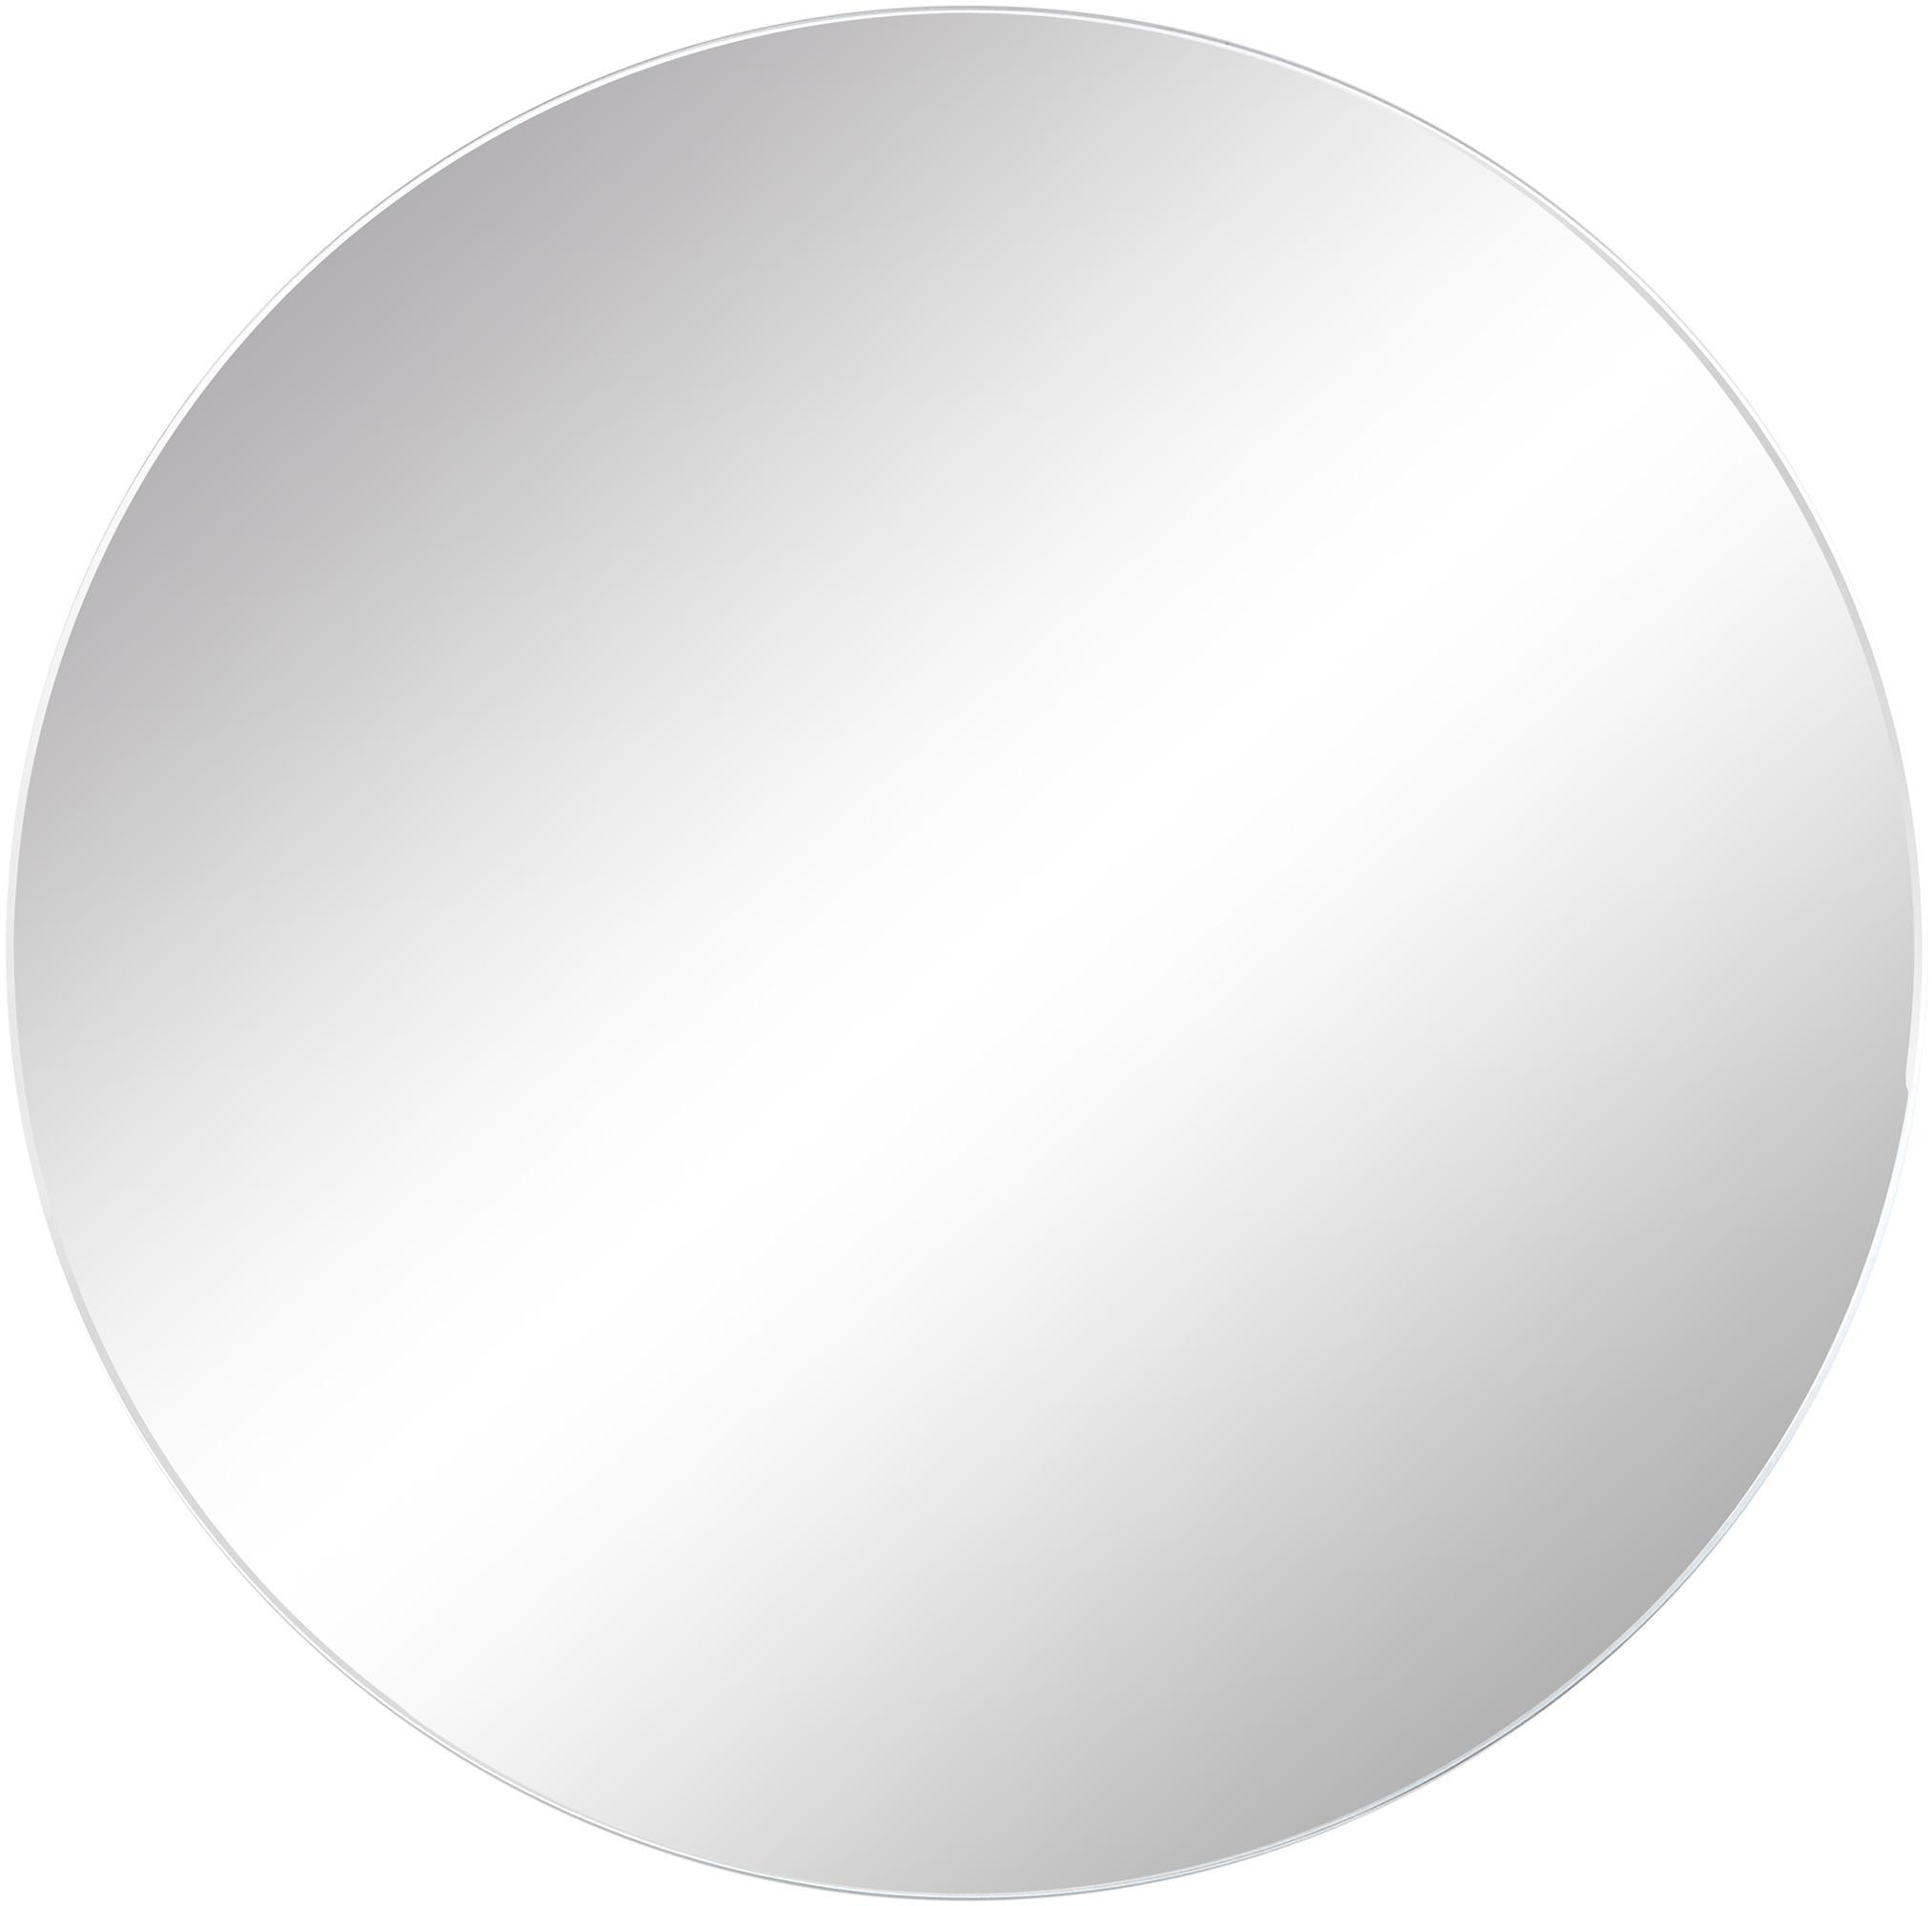 Espejo de pared redondo Erin, Espejo: cristal, Parte trasera: tablero de fibras de dens, Espejo, negro, Ø 40 cm